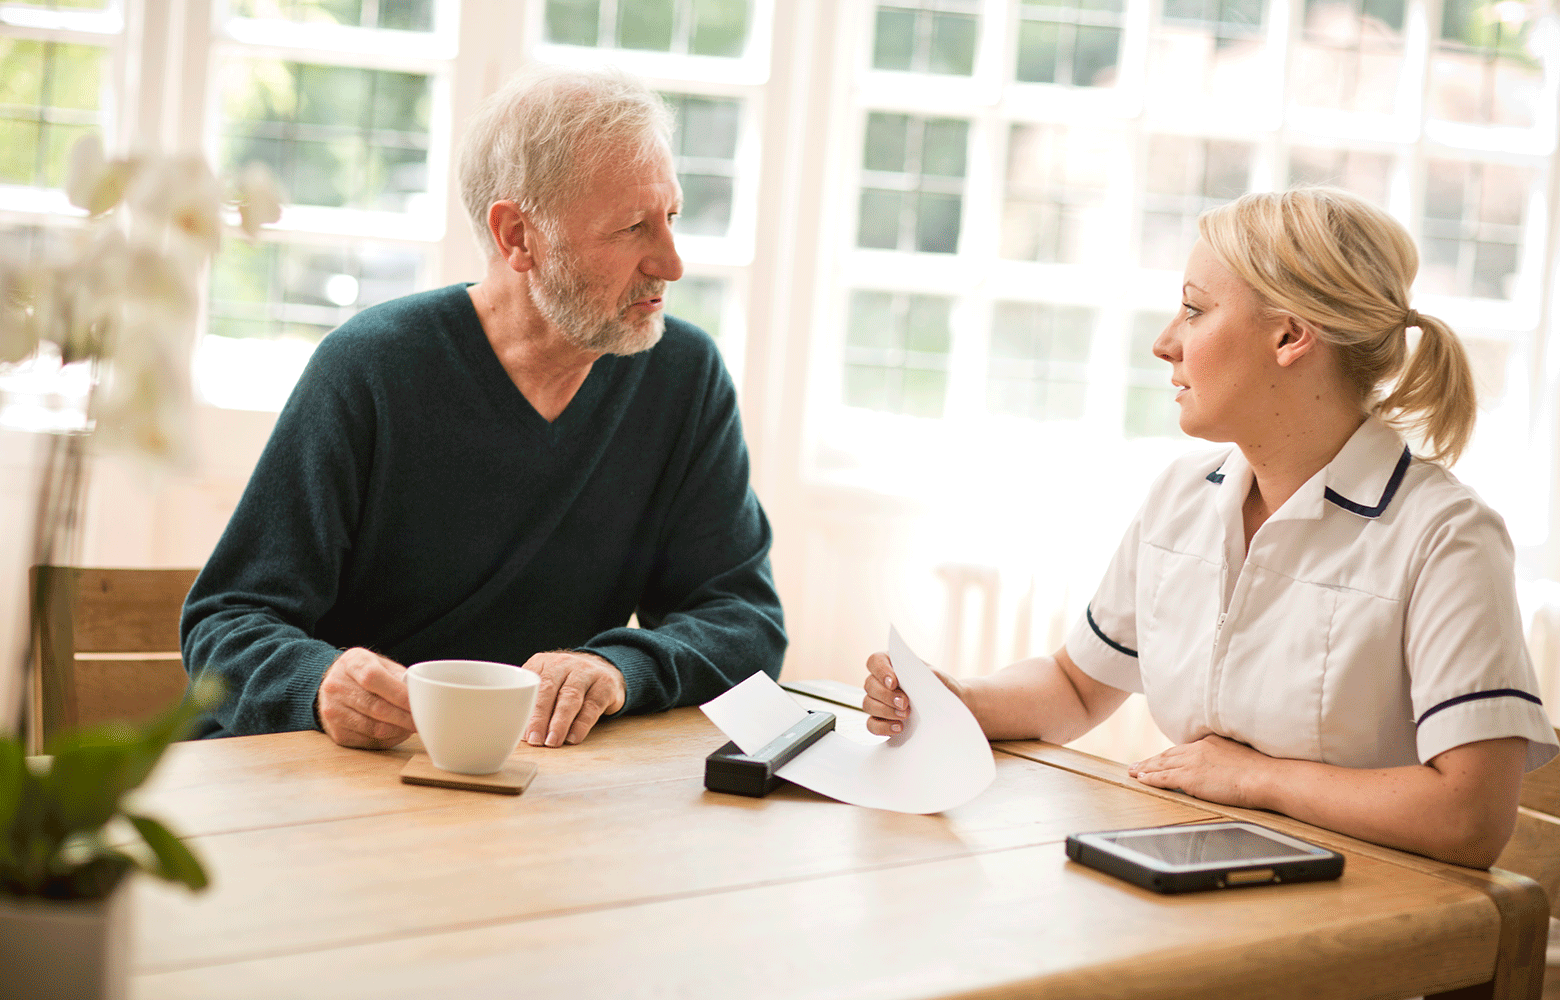 En helsearbeider sitter ved et bord i samtale med en pasient og skriver ut et dokument på en Brother mobil skriver i PJ-serien